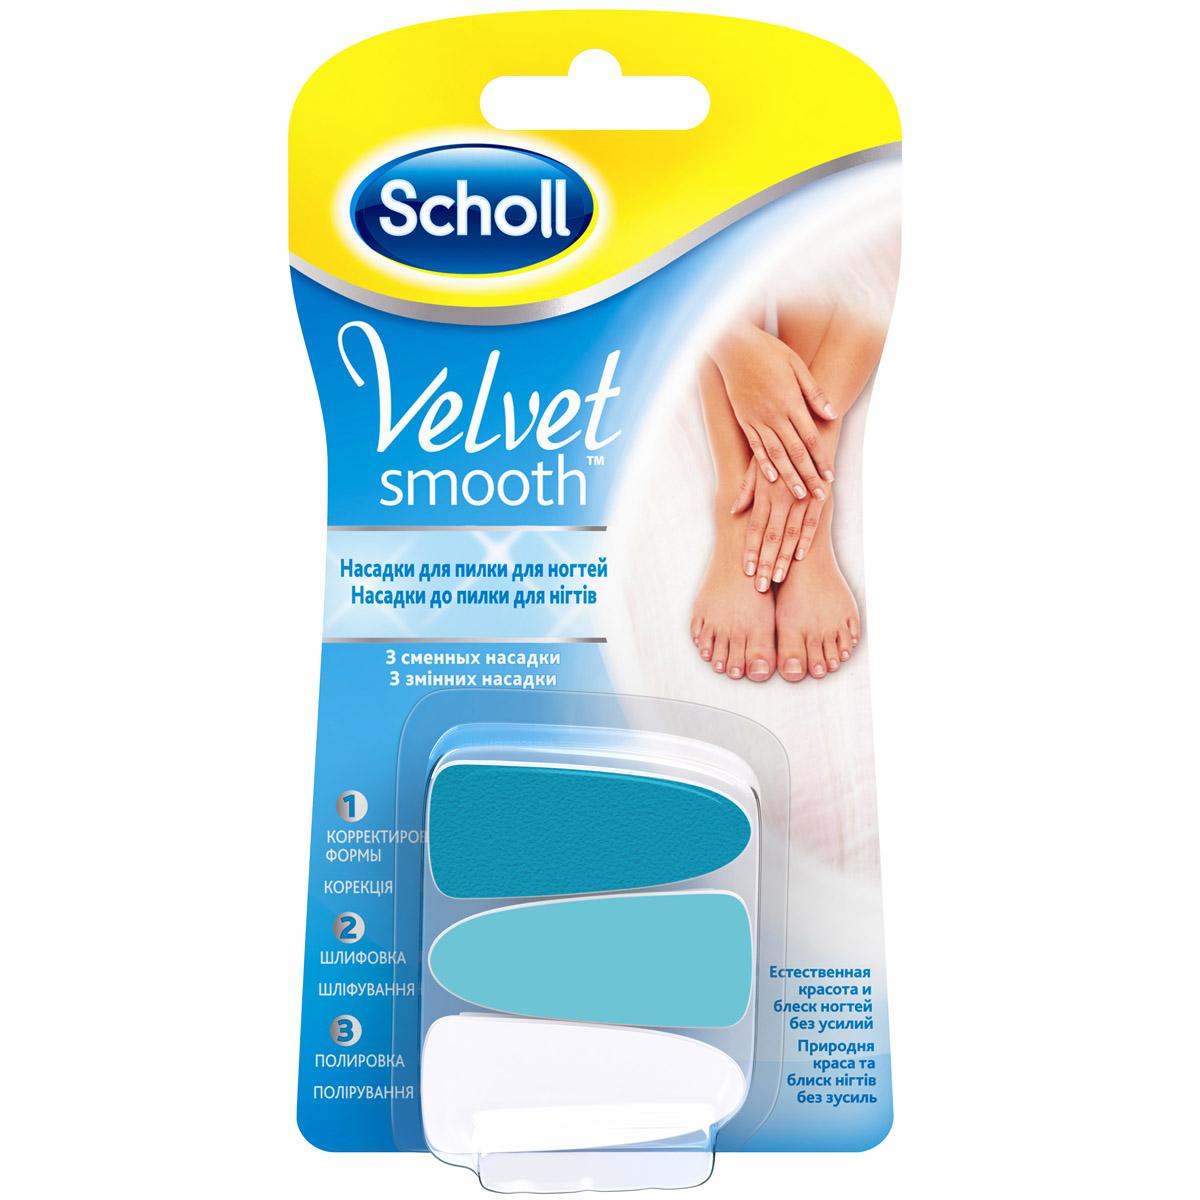 ������� ��� ������������� ����� Scholl Velvet Smooth ��� ����� �� ������� 3 ��